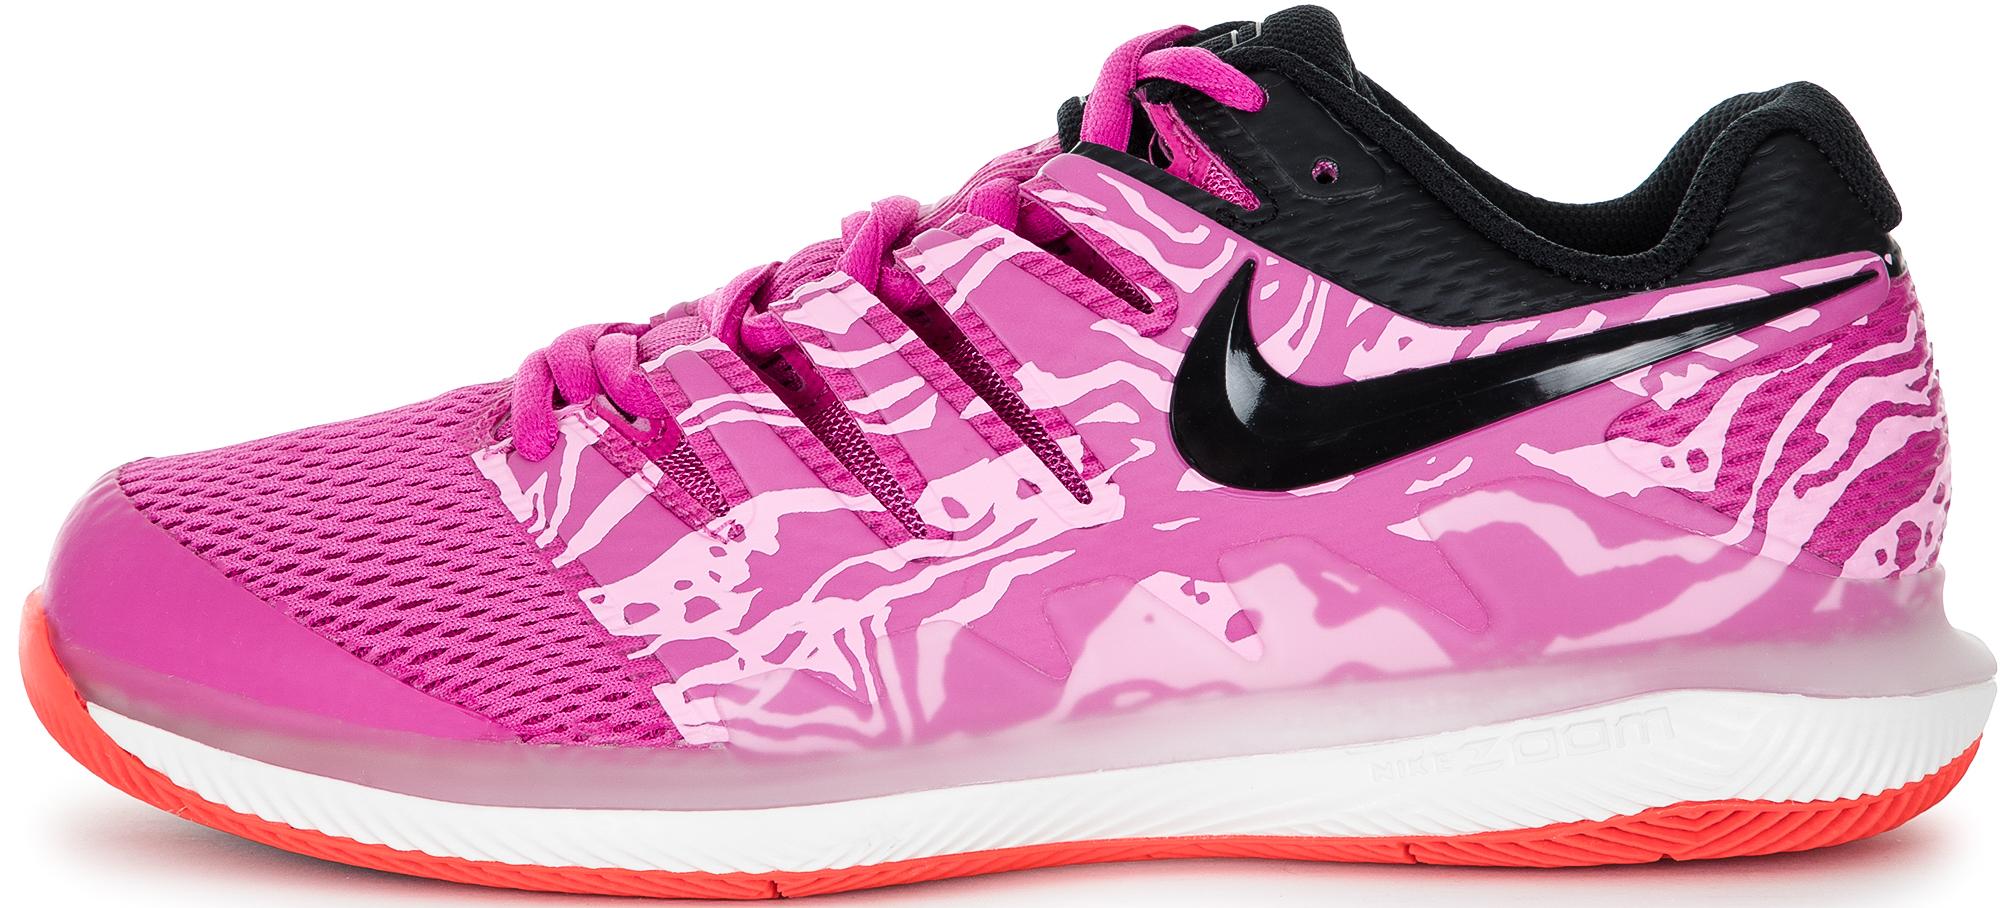 Nike Кроссовки женские Nike Air Zoom Vapor X Hc, размер 41